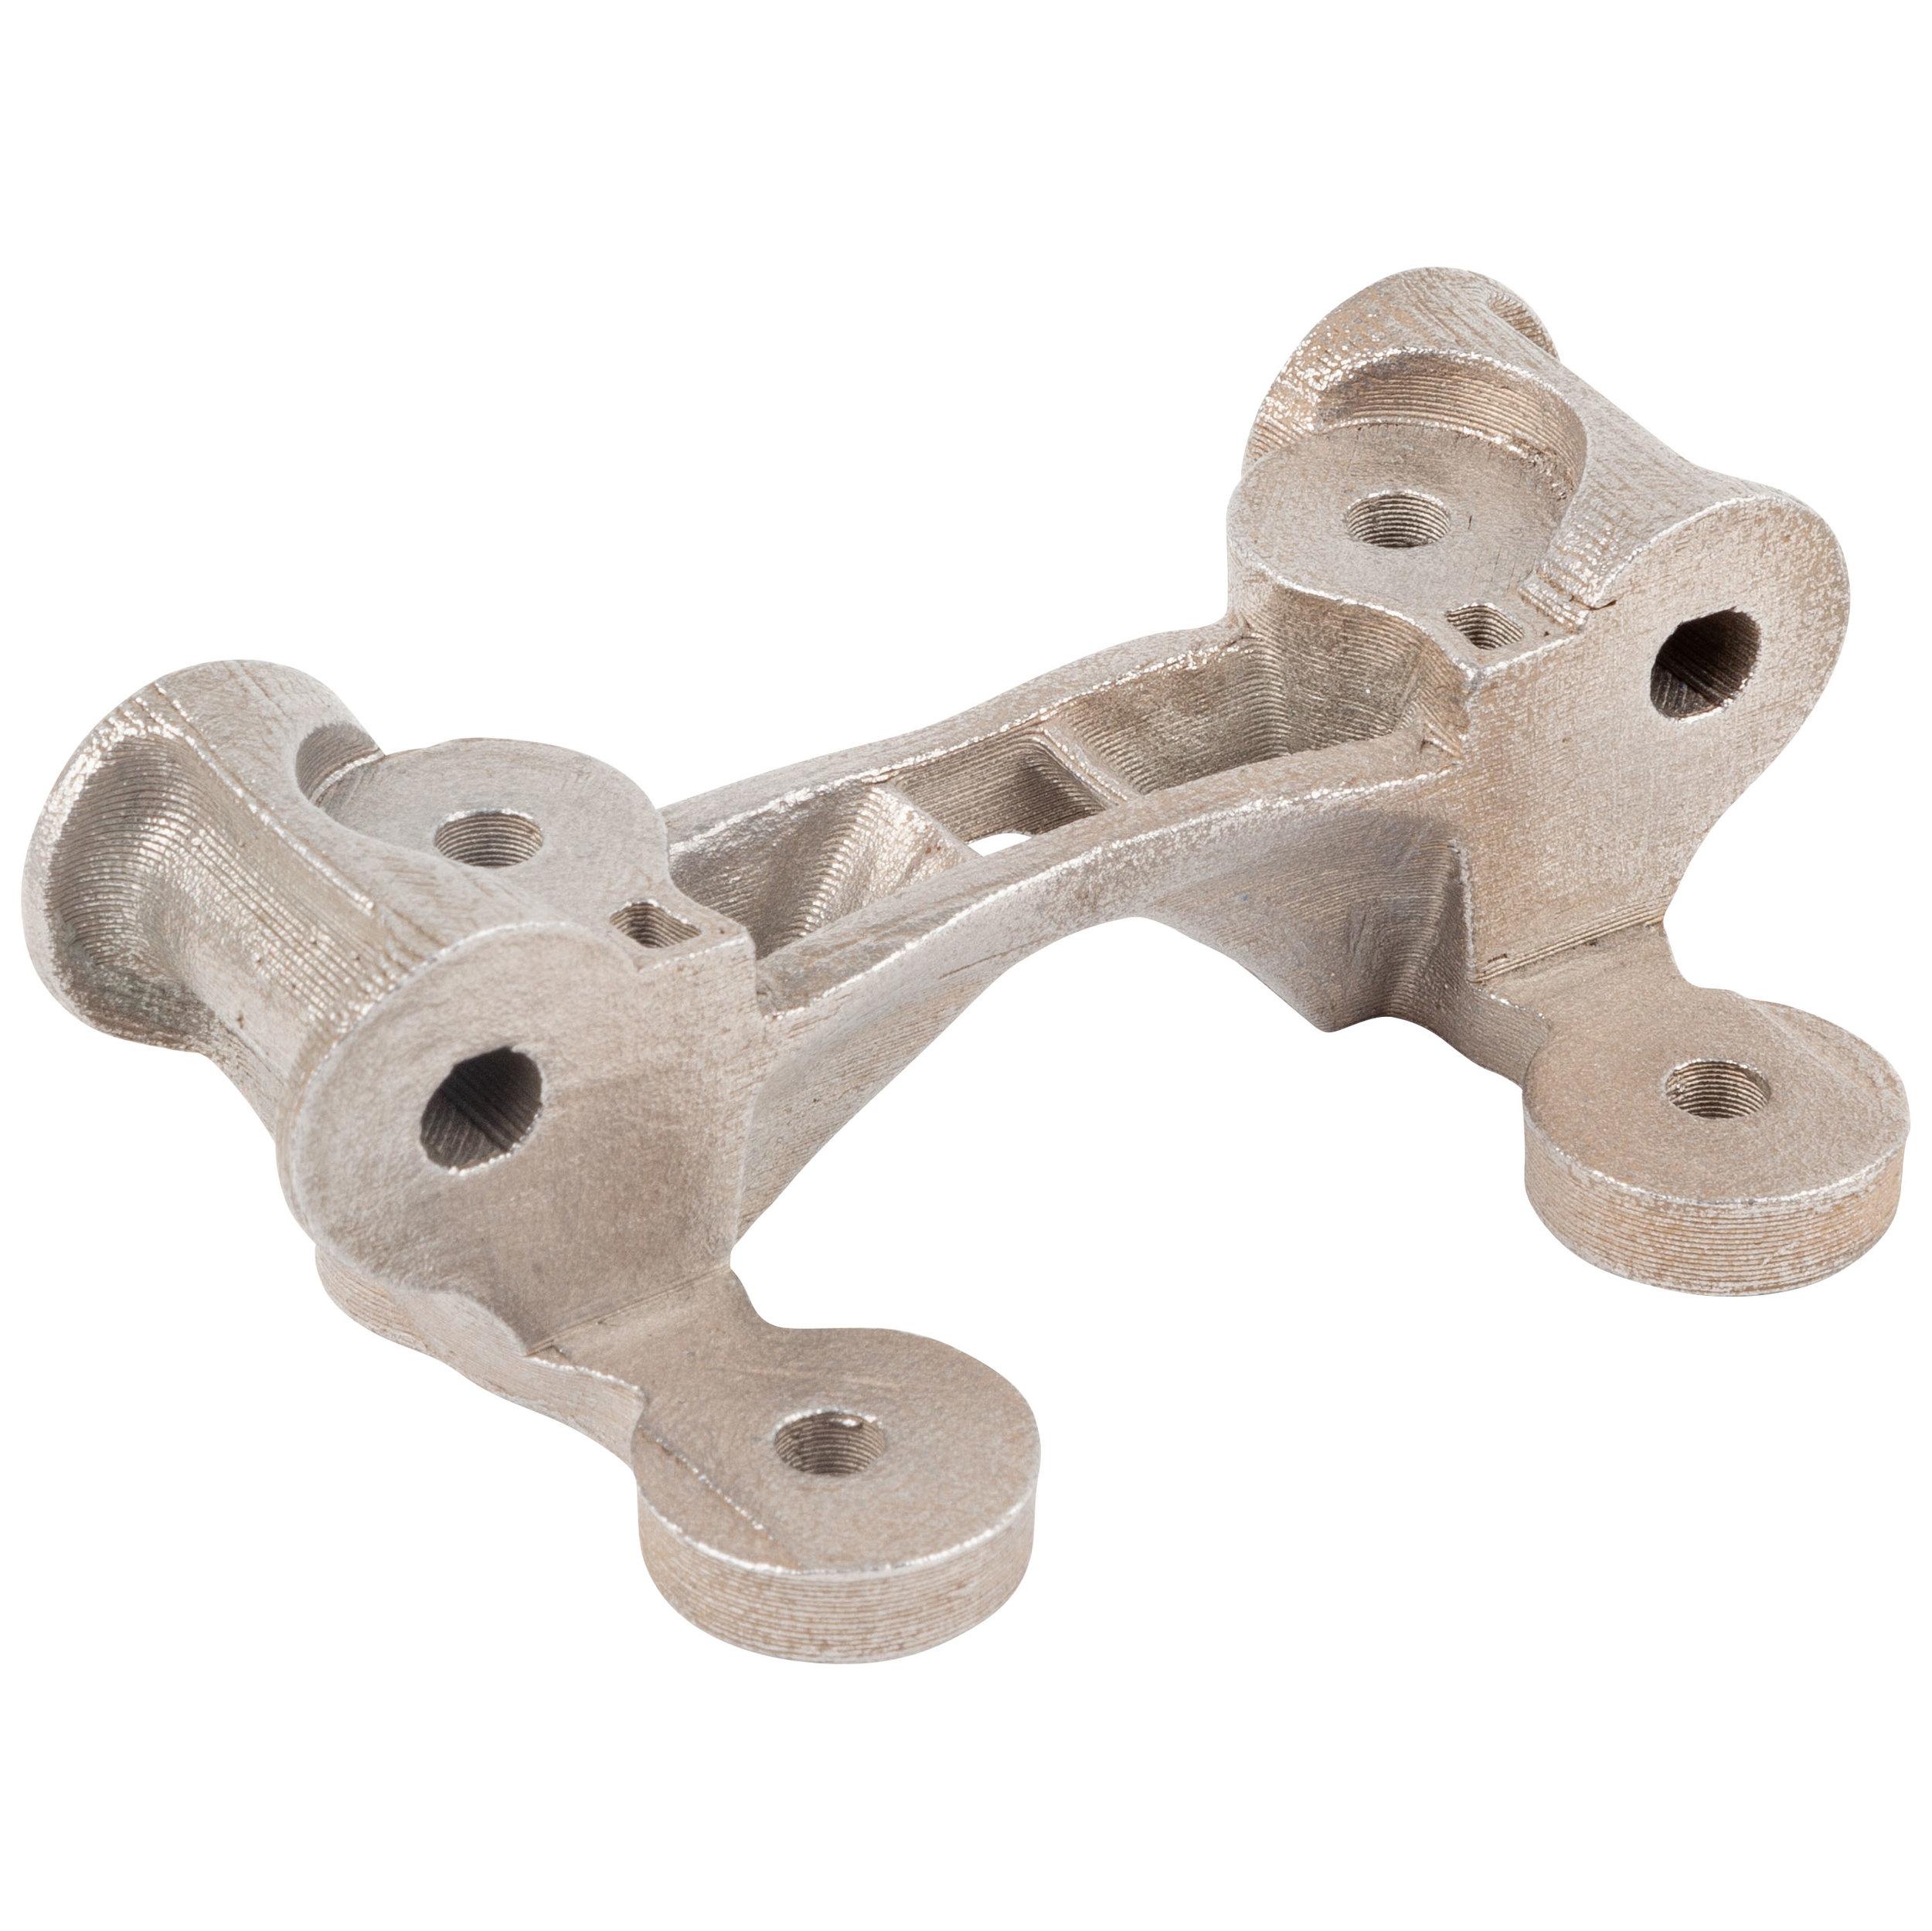 rapidia-metal-printing-removable-supports.jpg